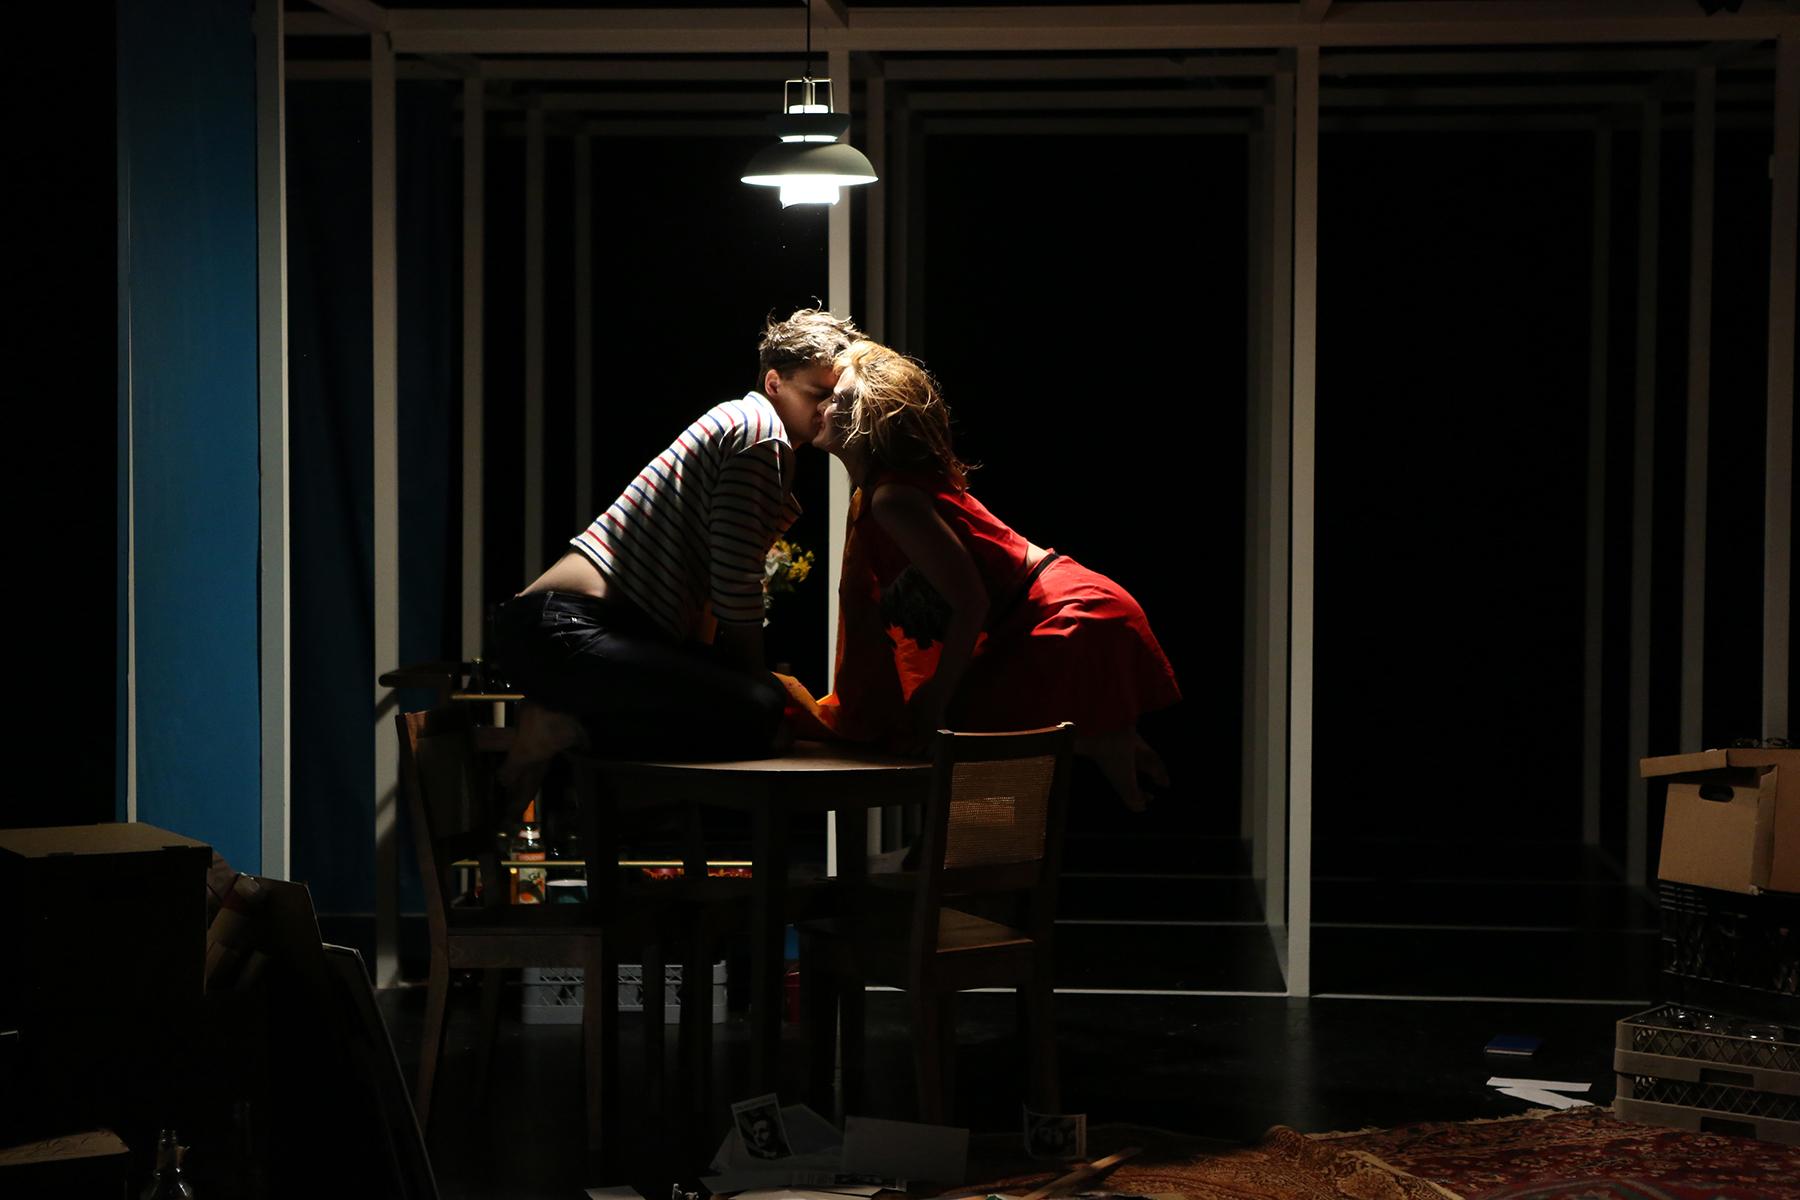 David and Gloria share a passionate kiss